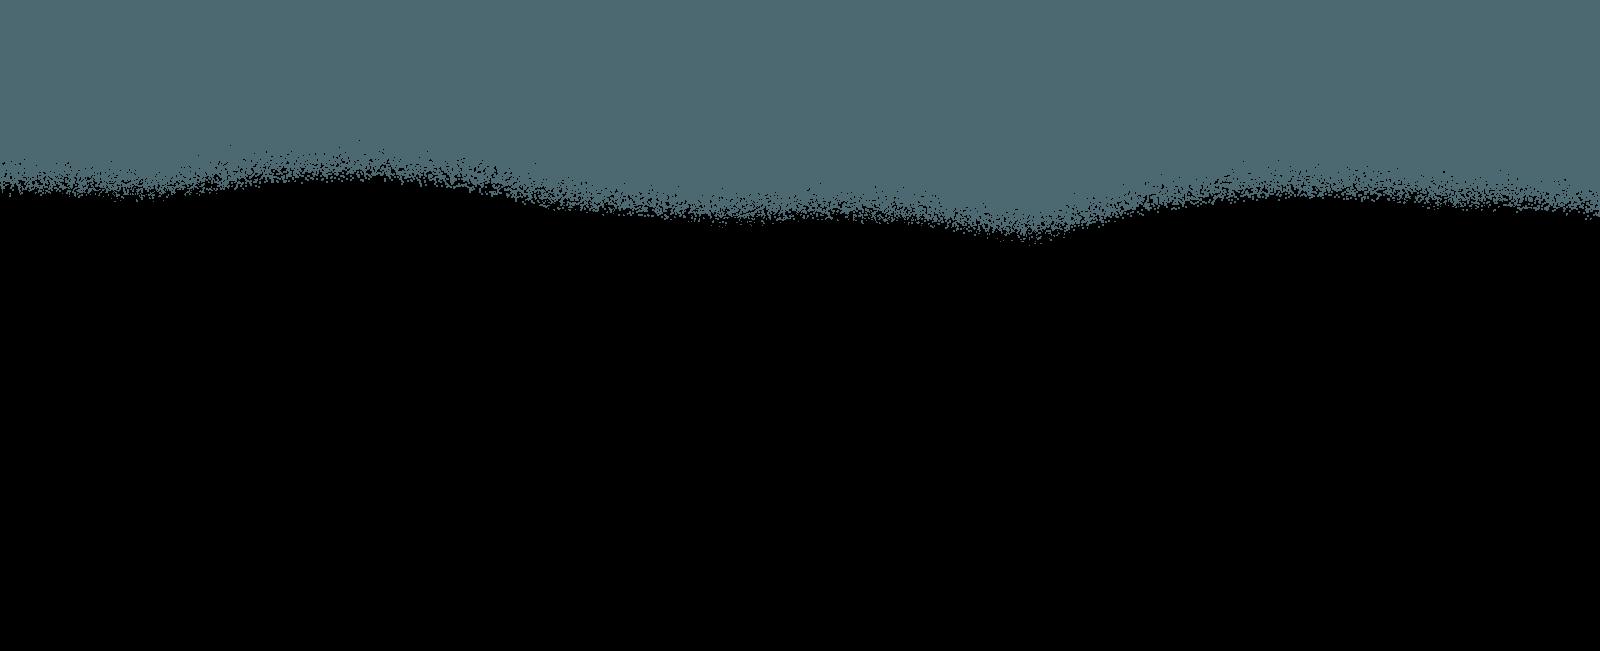 Efeito banner preto